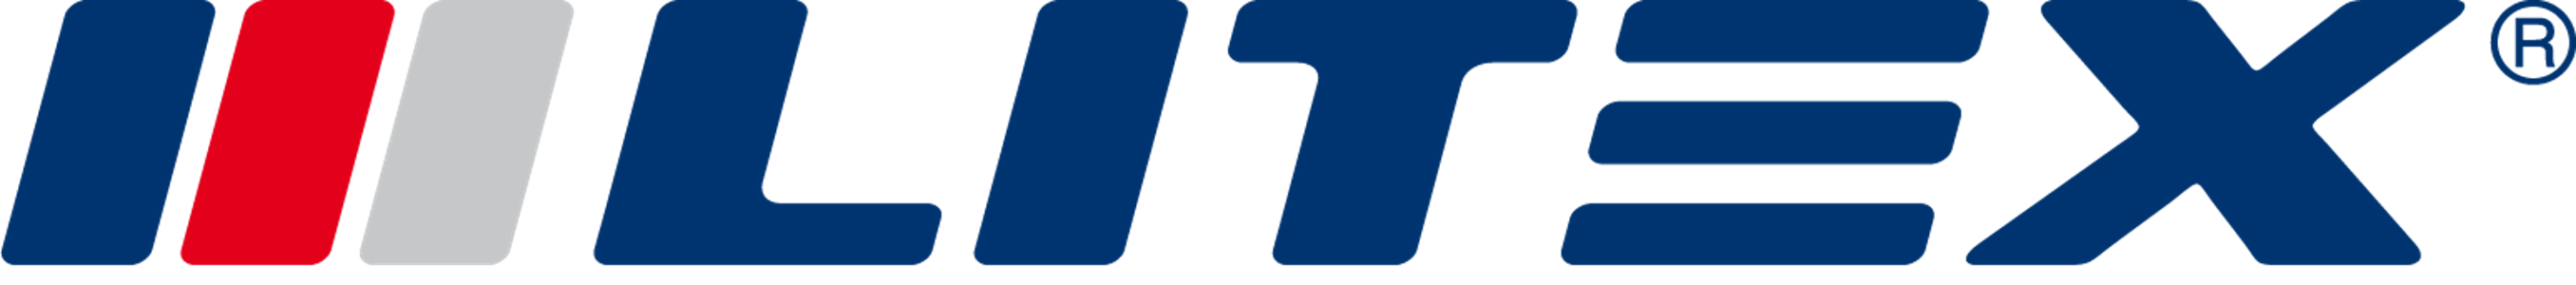 Litex - Sportswear and Swimwear